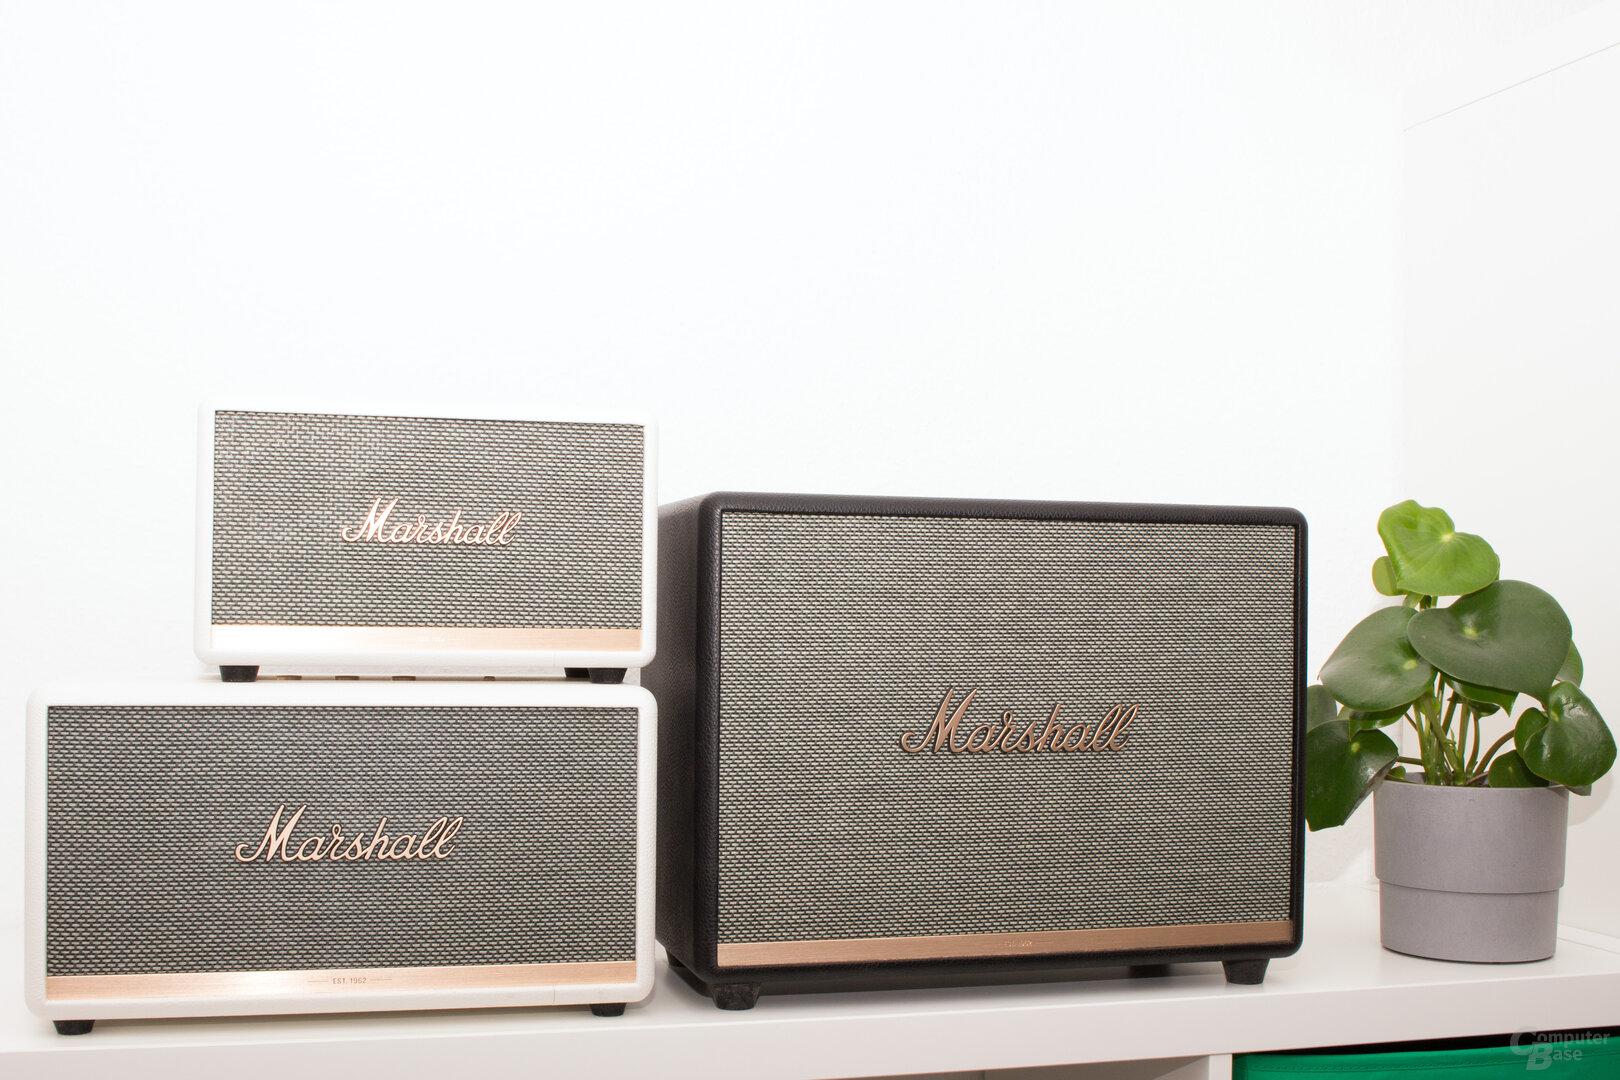 Marshall Bluetooth-Lautsprecher im Test